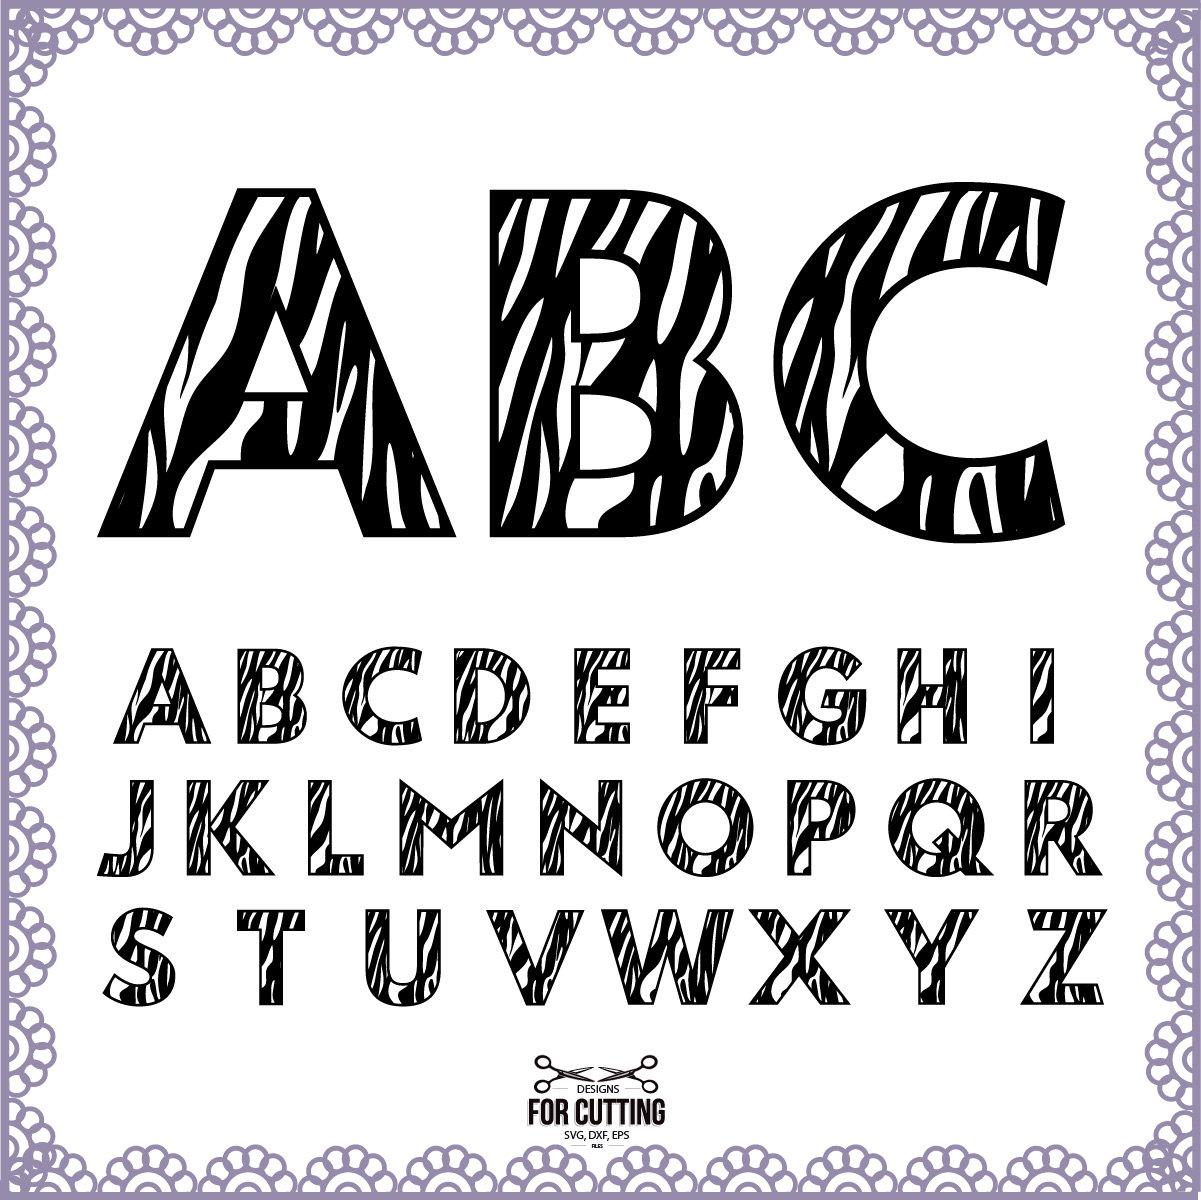 Zebra Alphabet Monogram Zebra font Cut Files Svg Eps Dxf. Zebra 0 Font